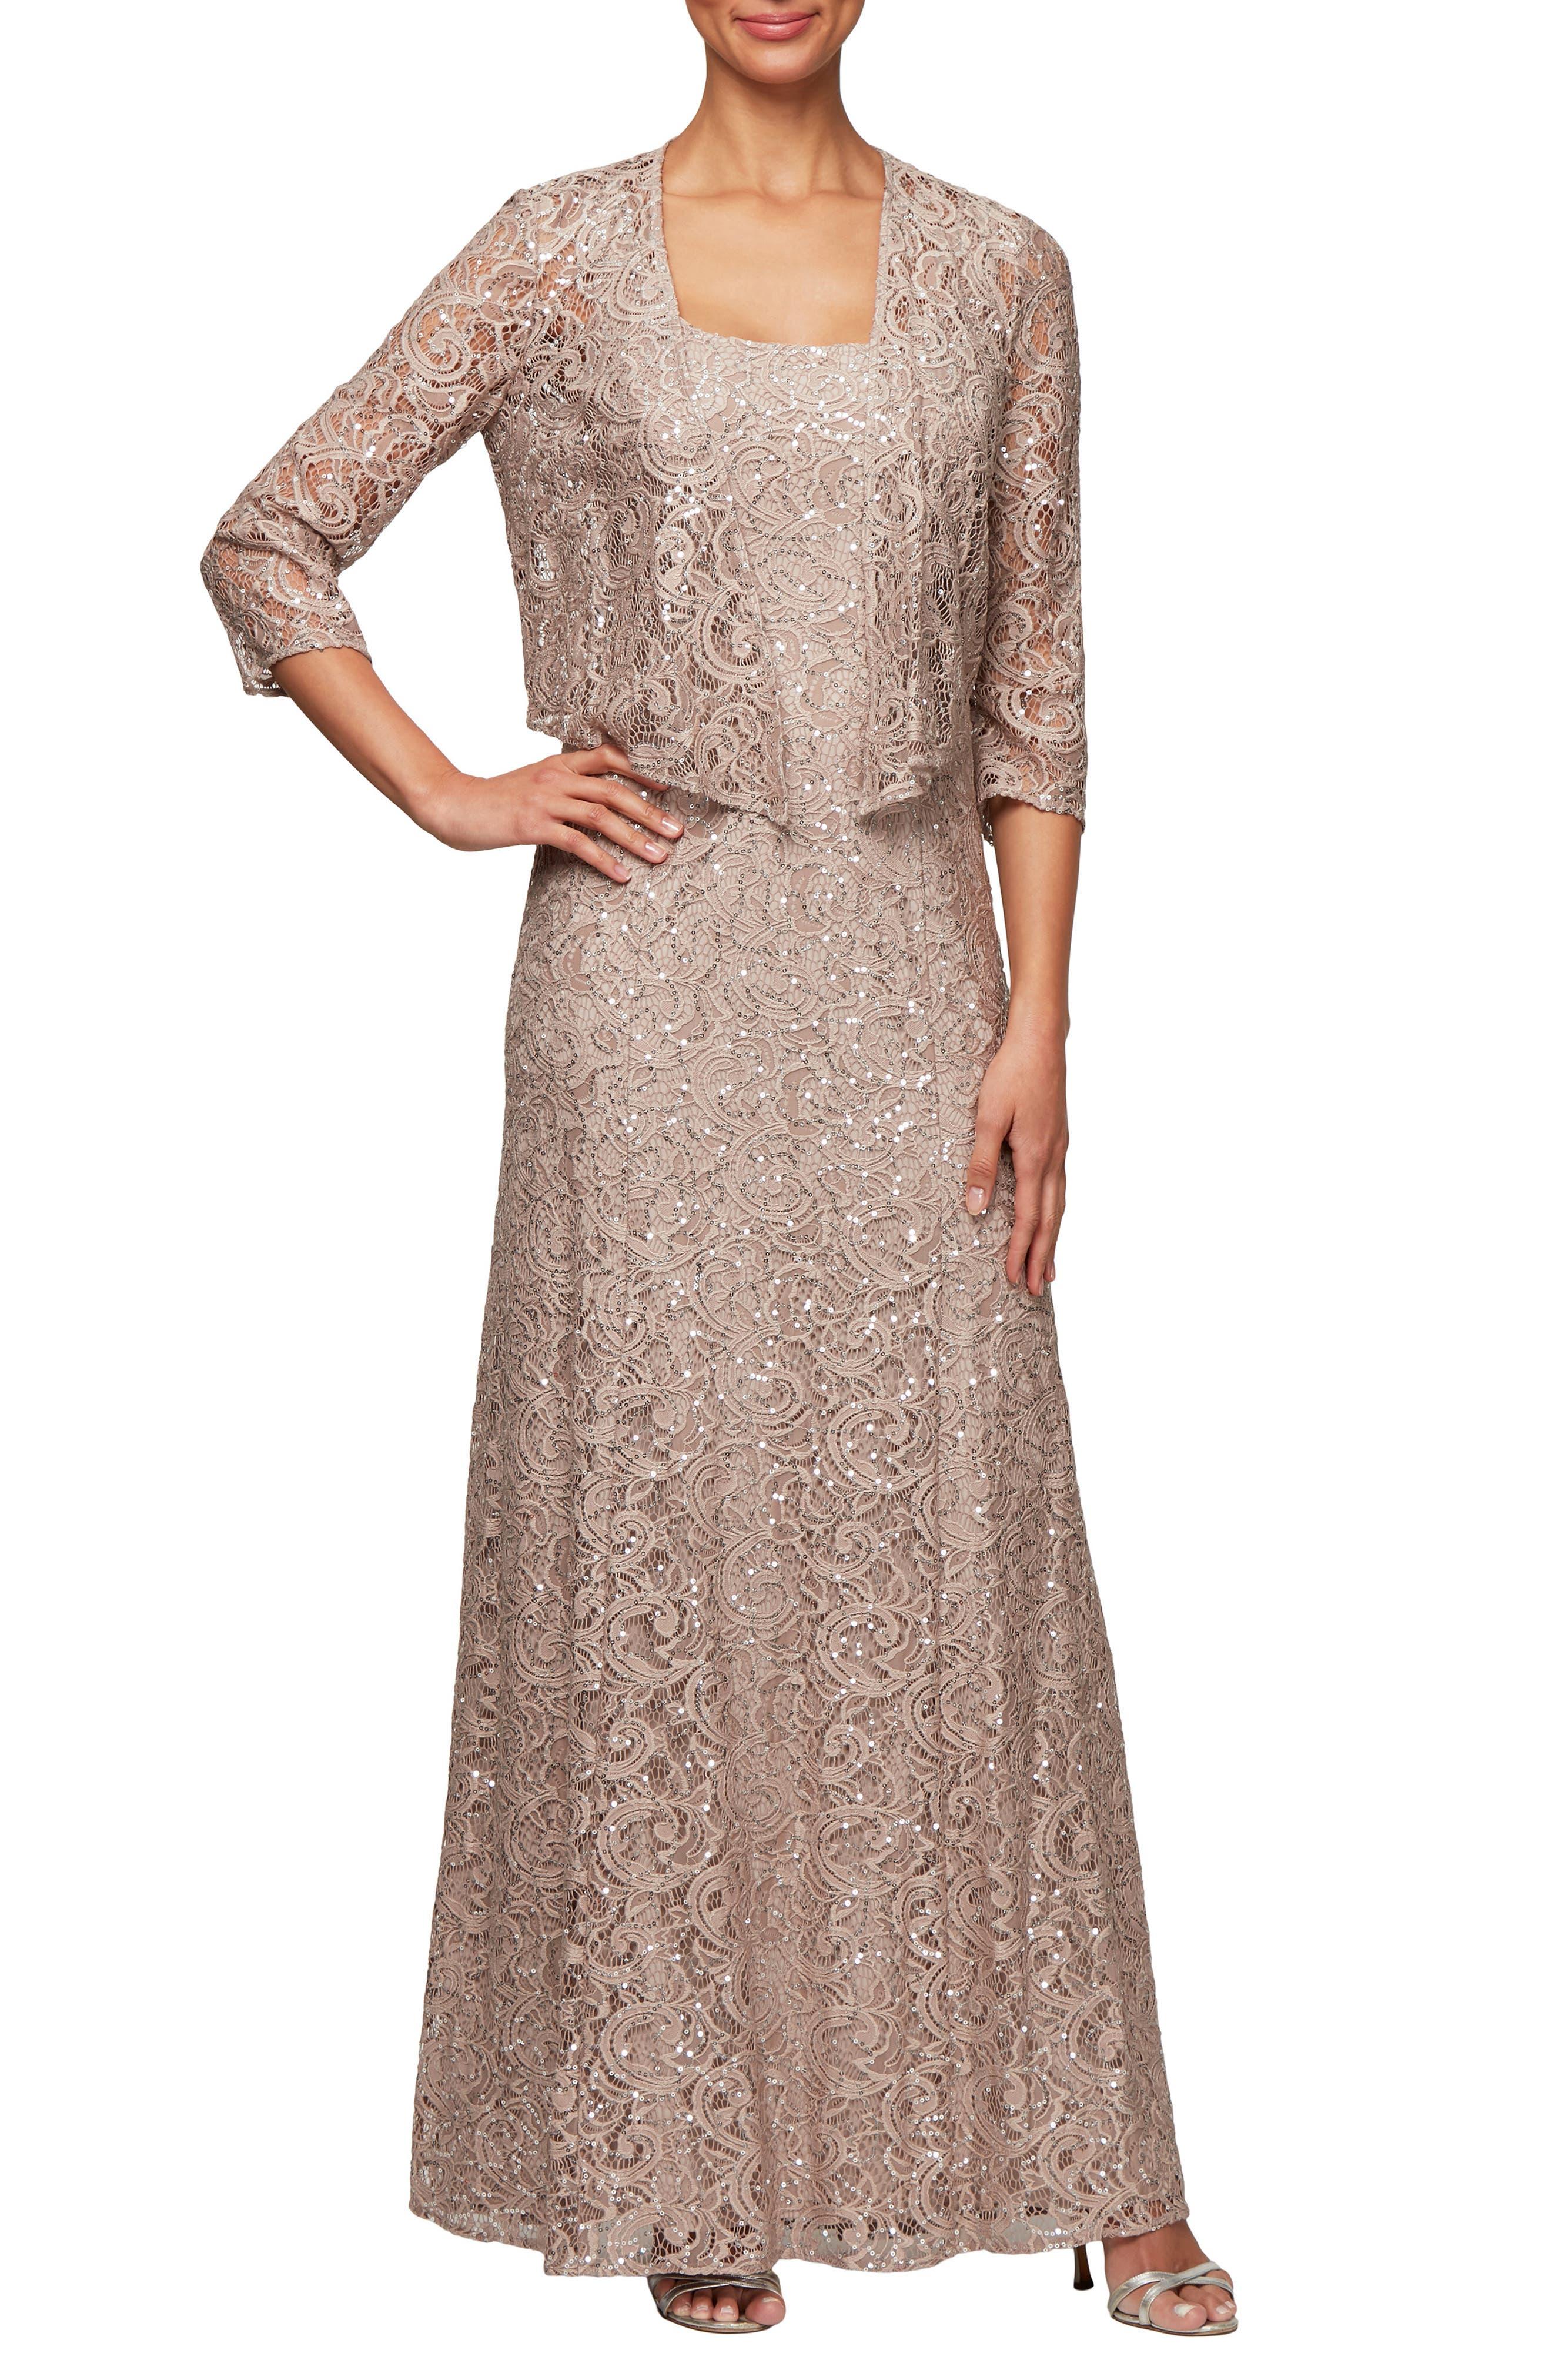 Alex Evenings Sequin Lace Jacket Gown, 8 (similar to 1) - Beige